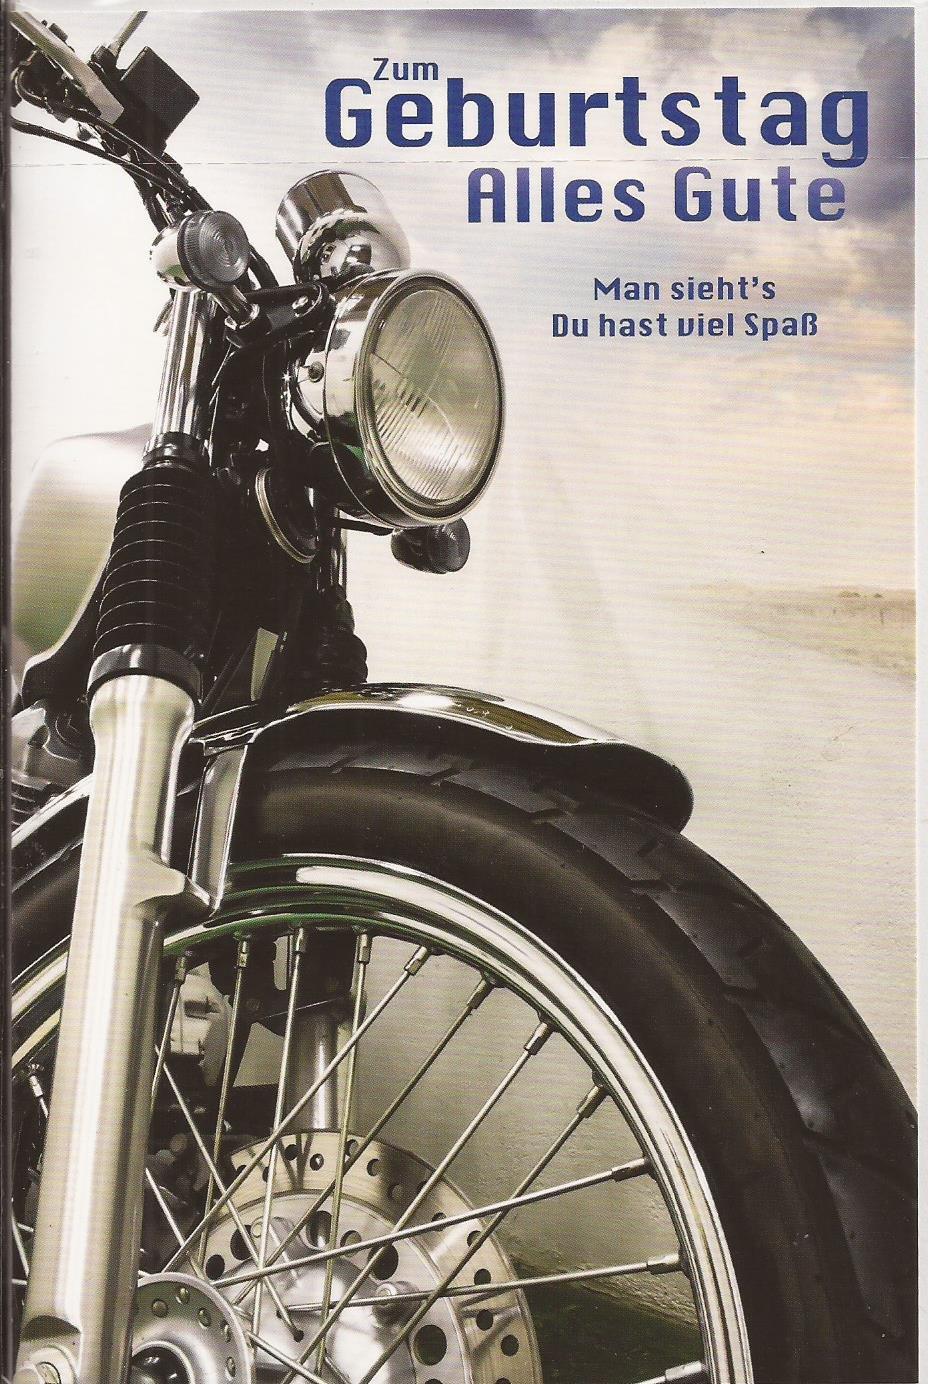 Alles Gute Zum Geburtstag Fur Motorradfahrer Hylen Maddawards Com